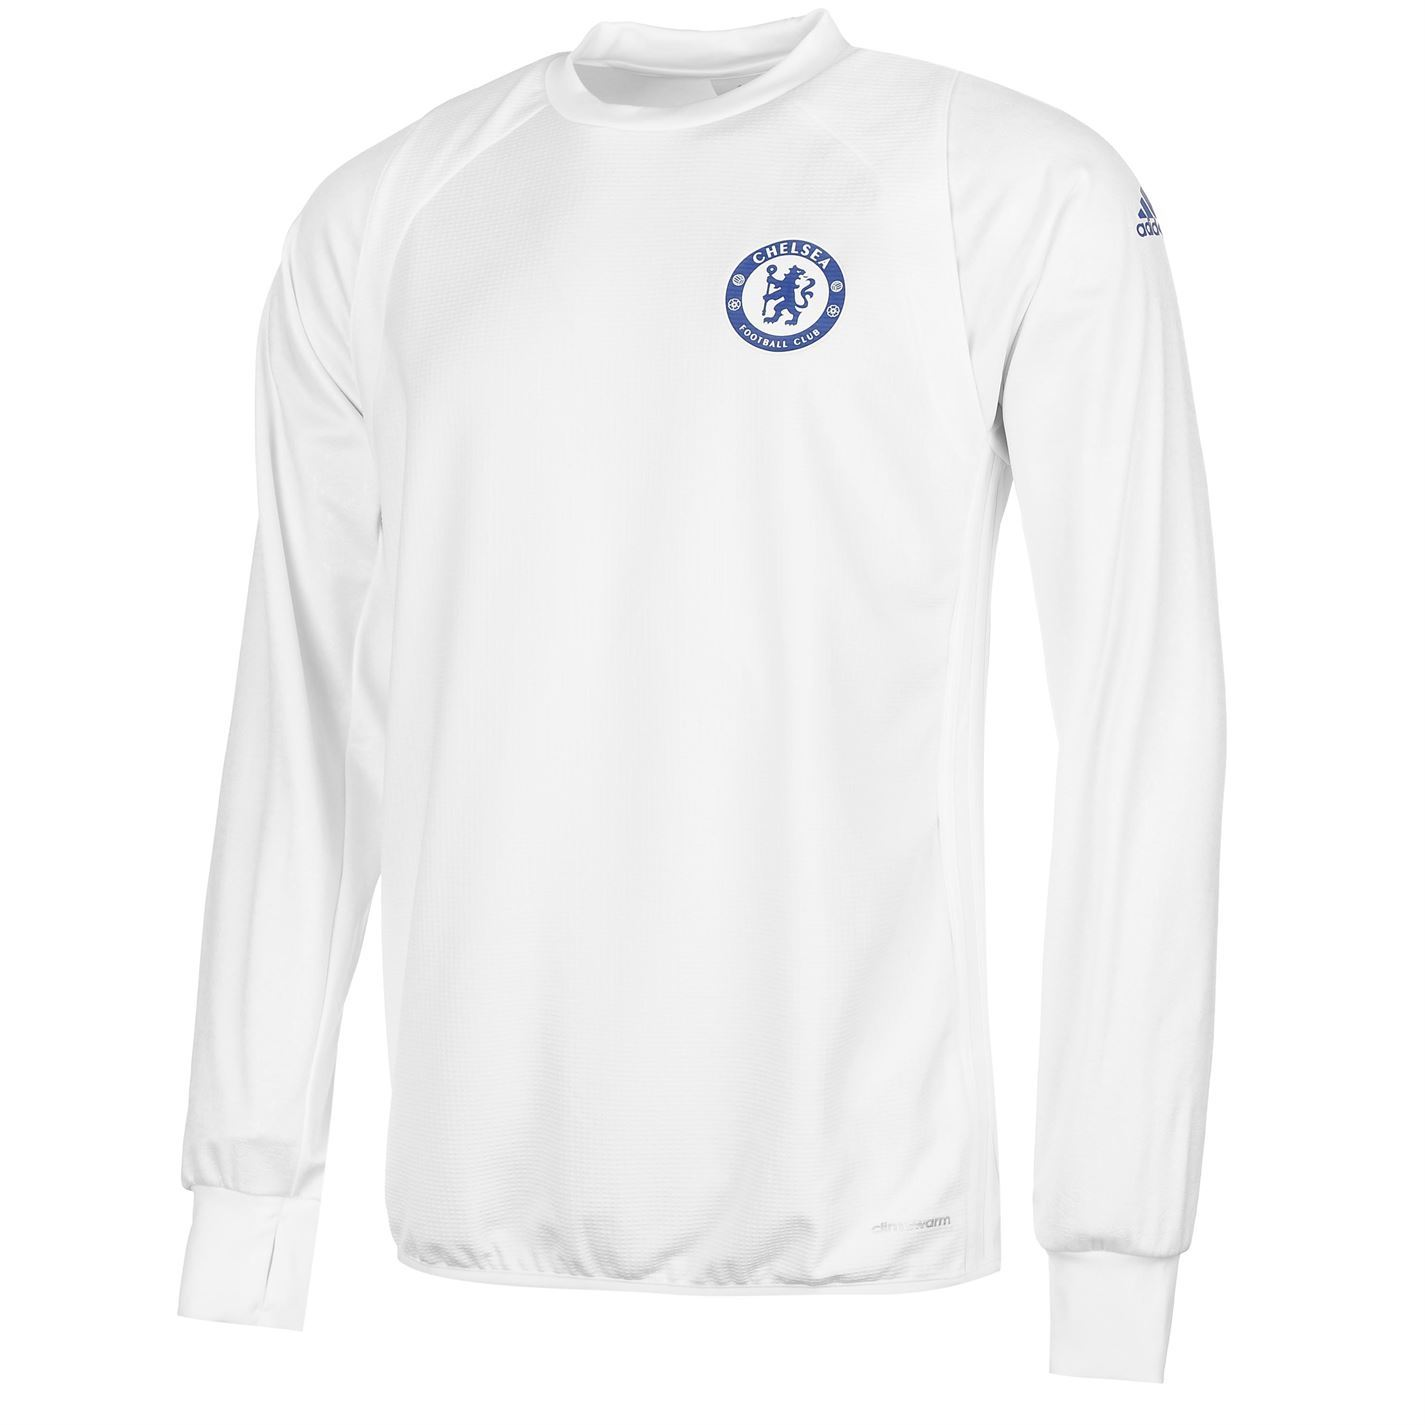 About Shirt Training Adidas Sweater Mens Chelsea Top Soccer Football Details White Sweatshirt wPkXZiOuT